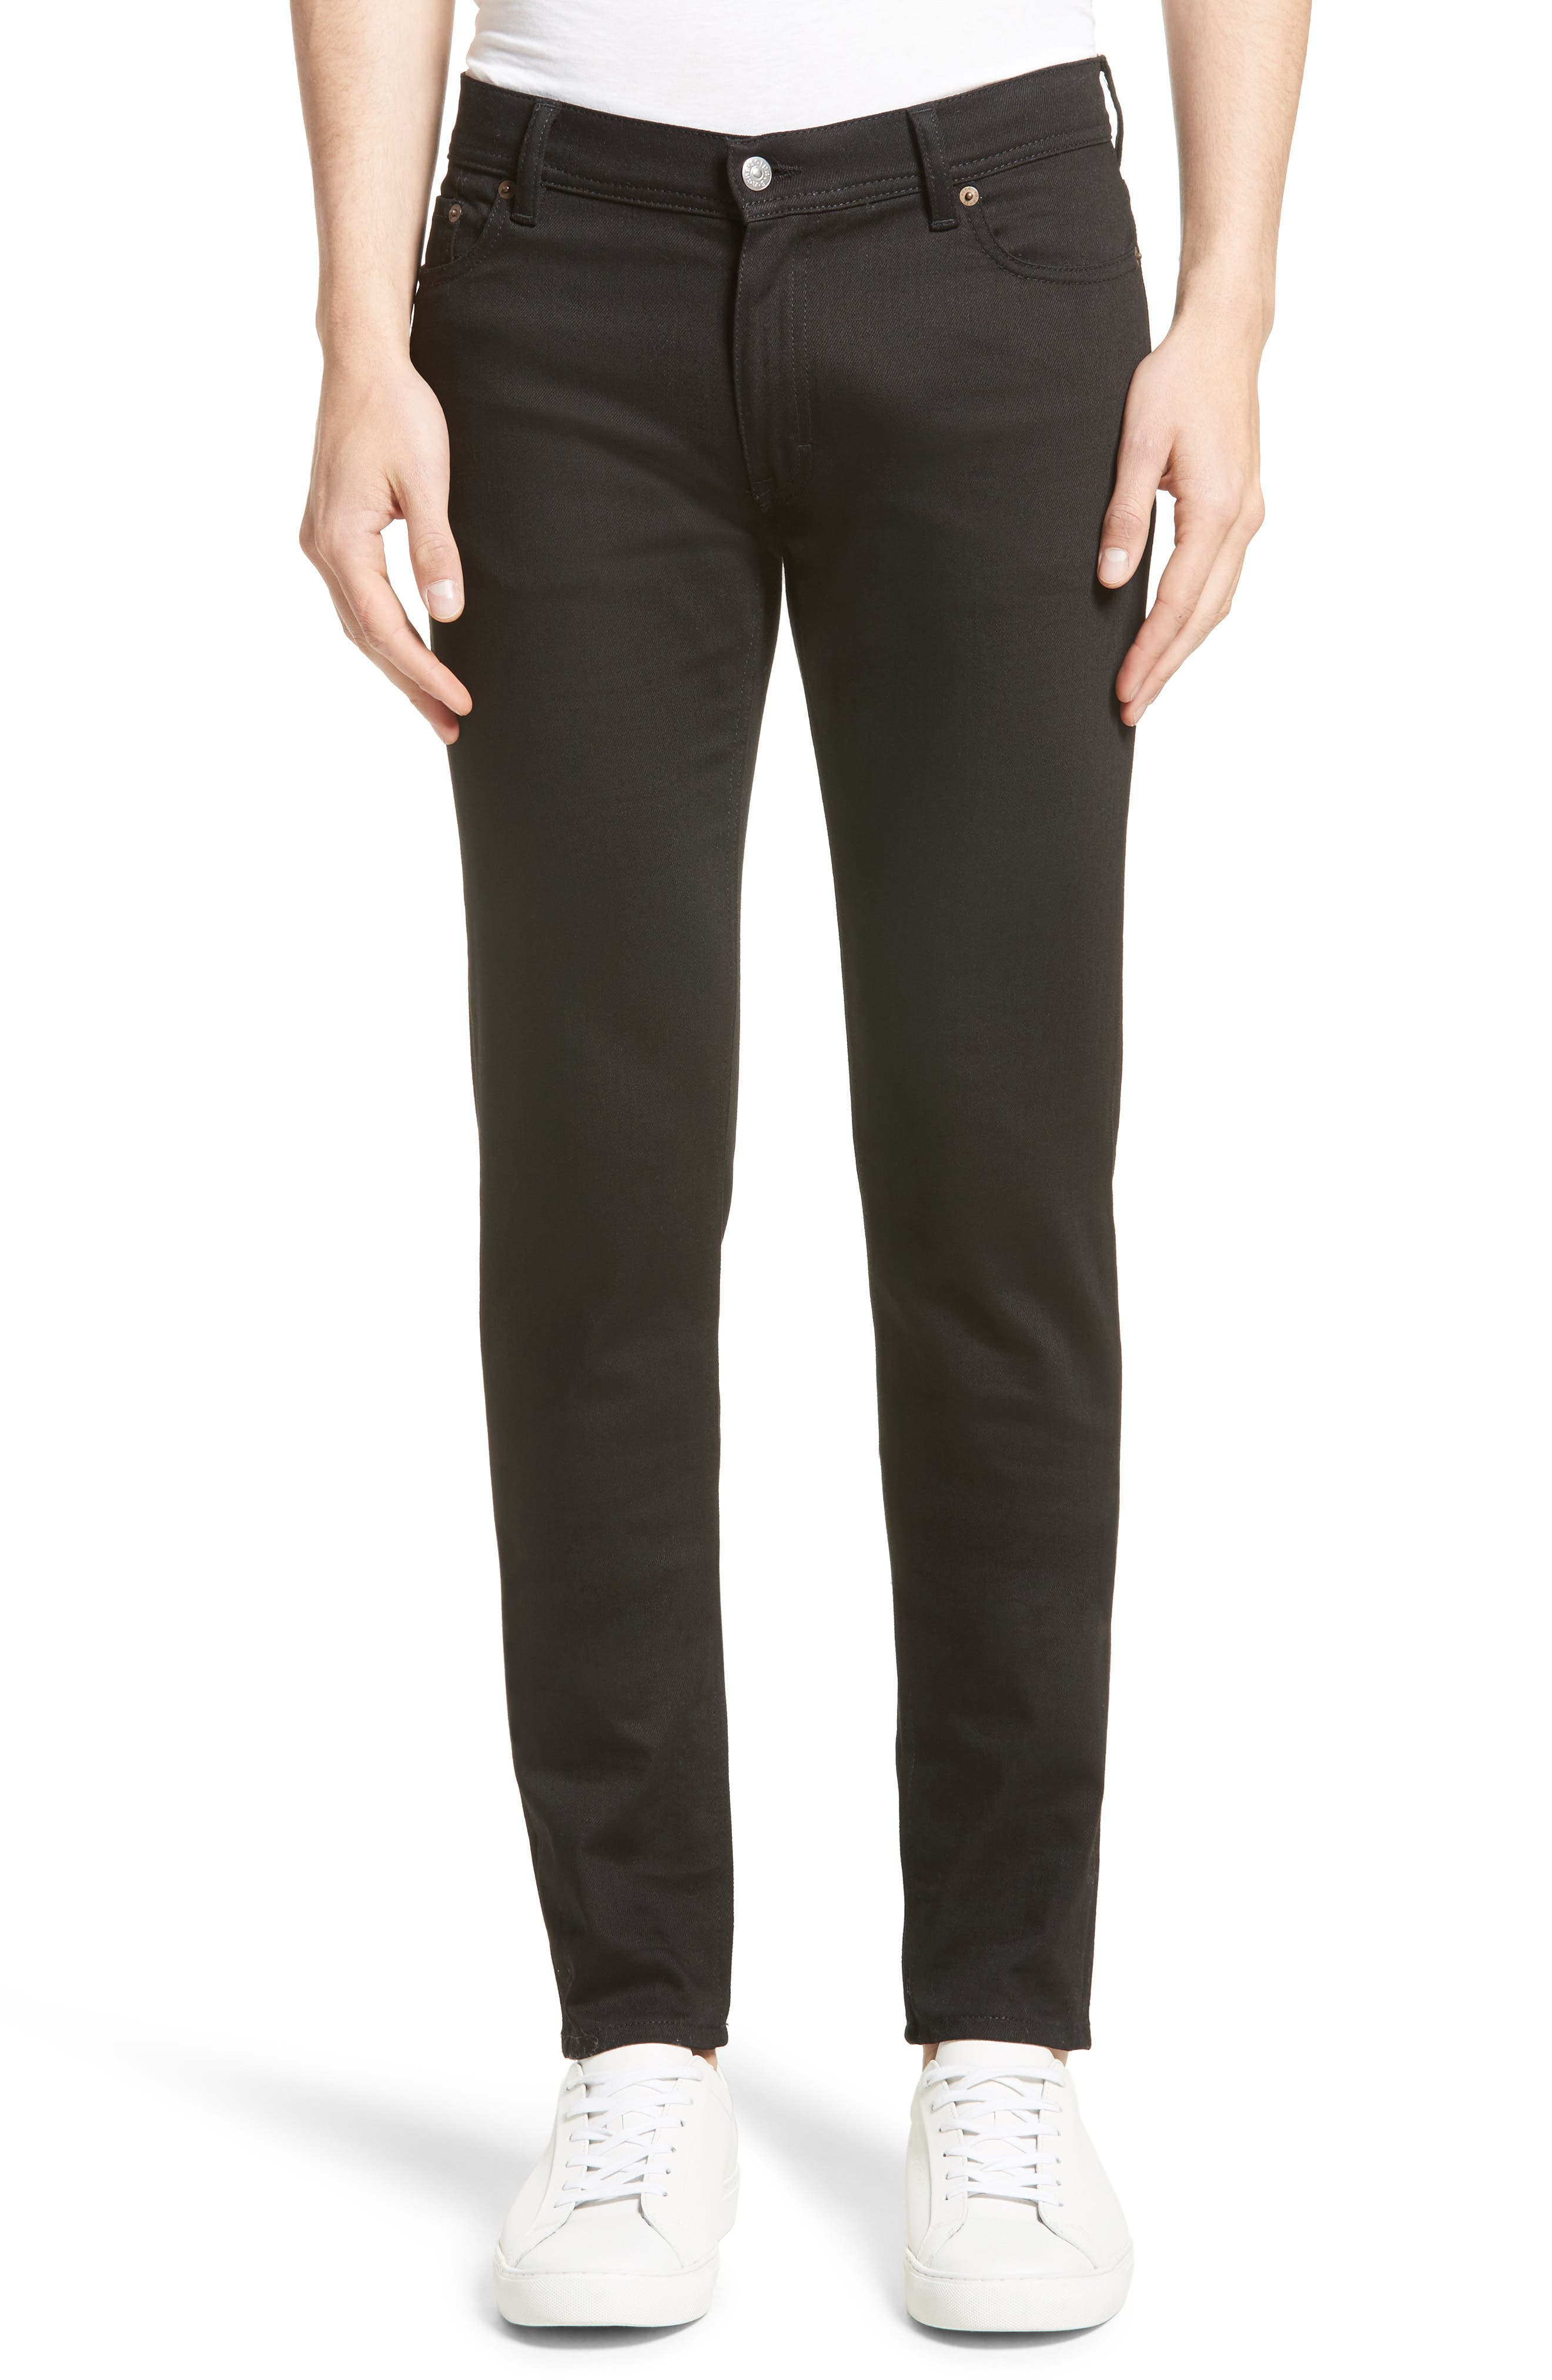 North Skinny Jeans,                             Main thumbnail 1, color,                             001